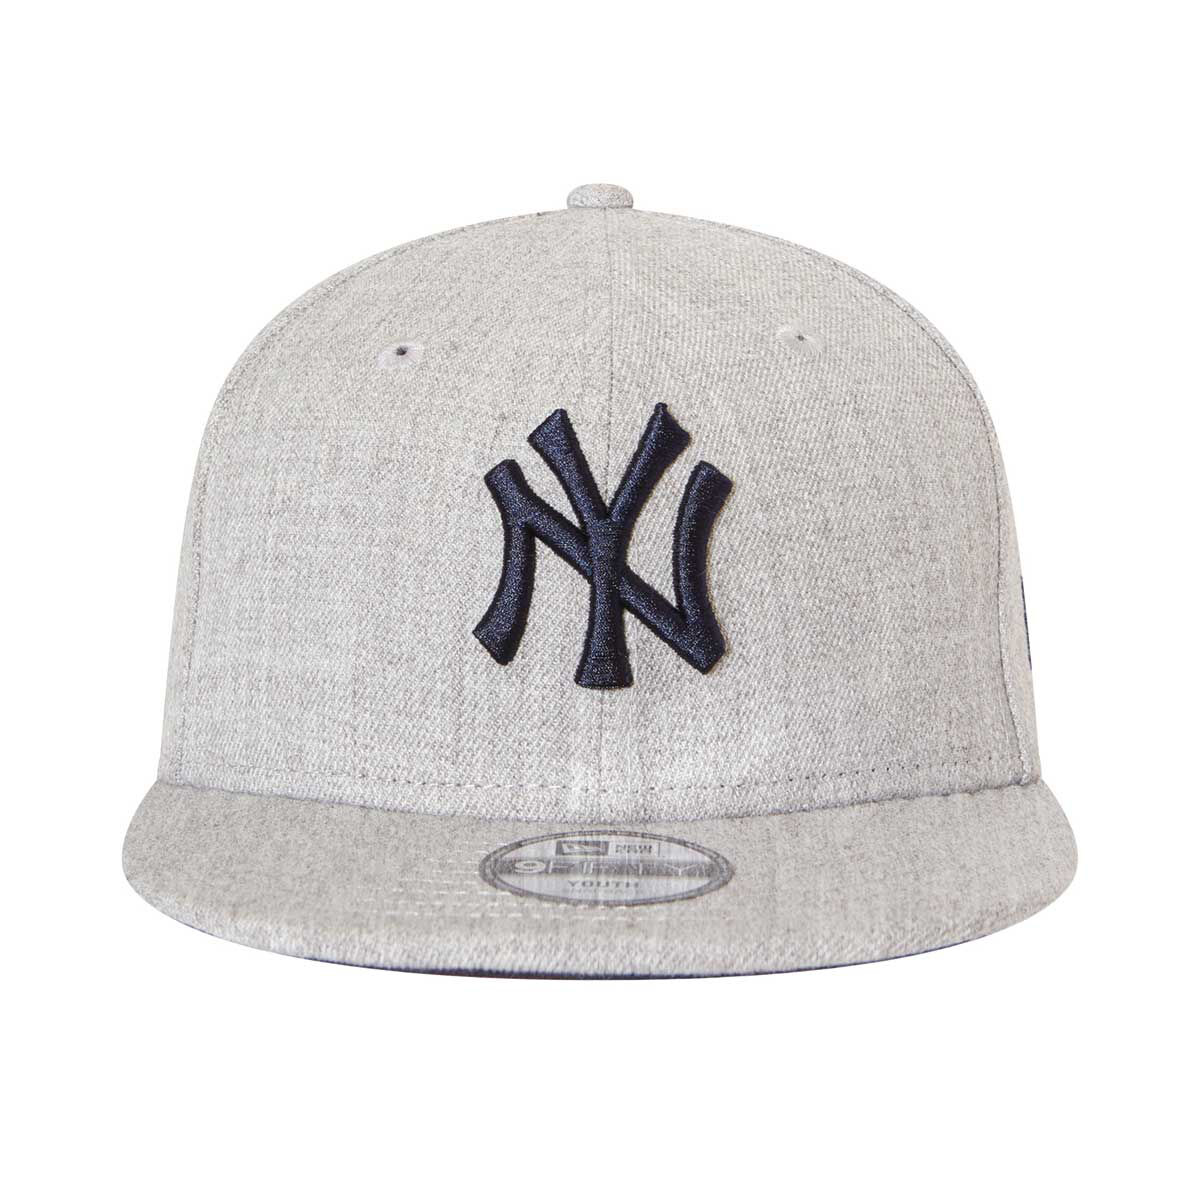 ... where can i buy new york yankees kids new era 9forty cap rebelhi res  e5cb0 35e9c b962b53e9fb8